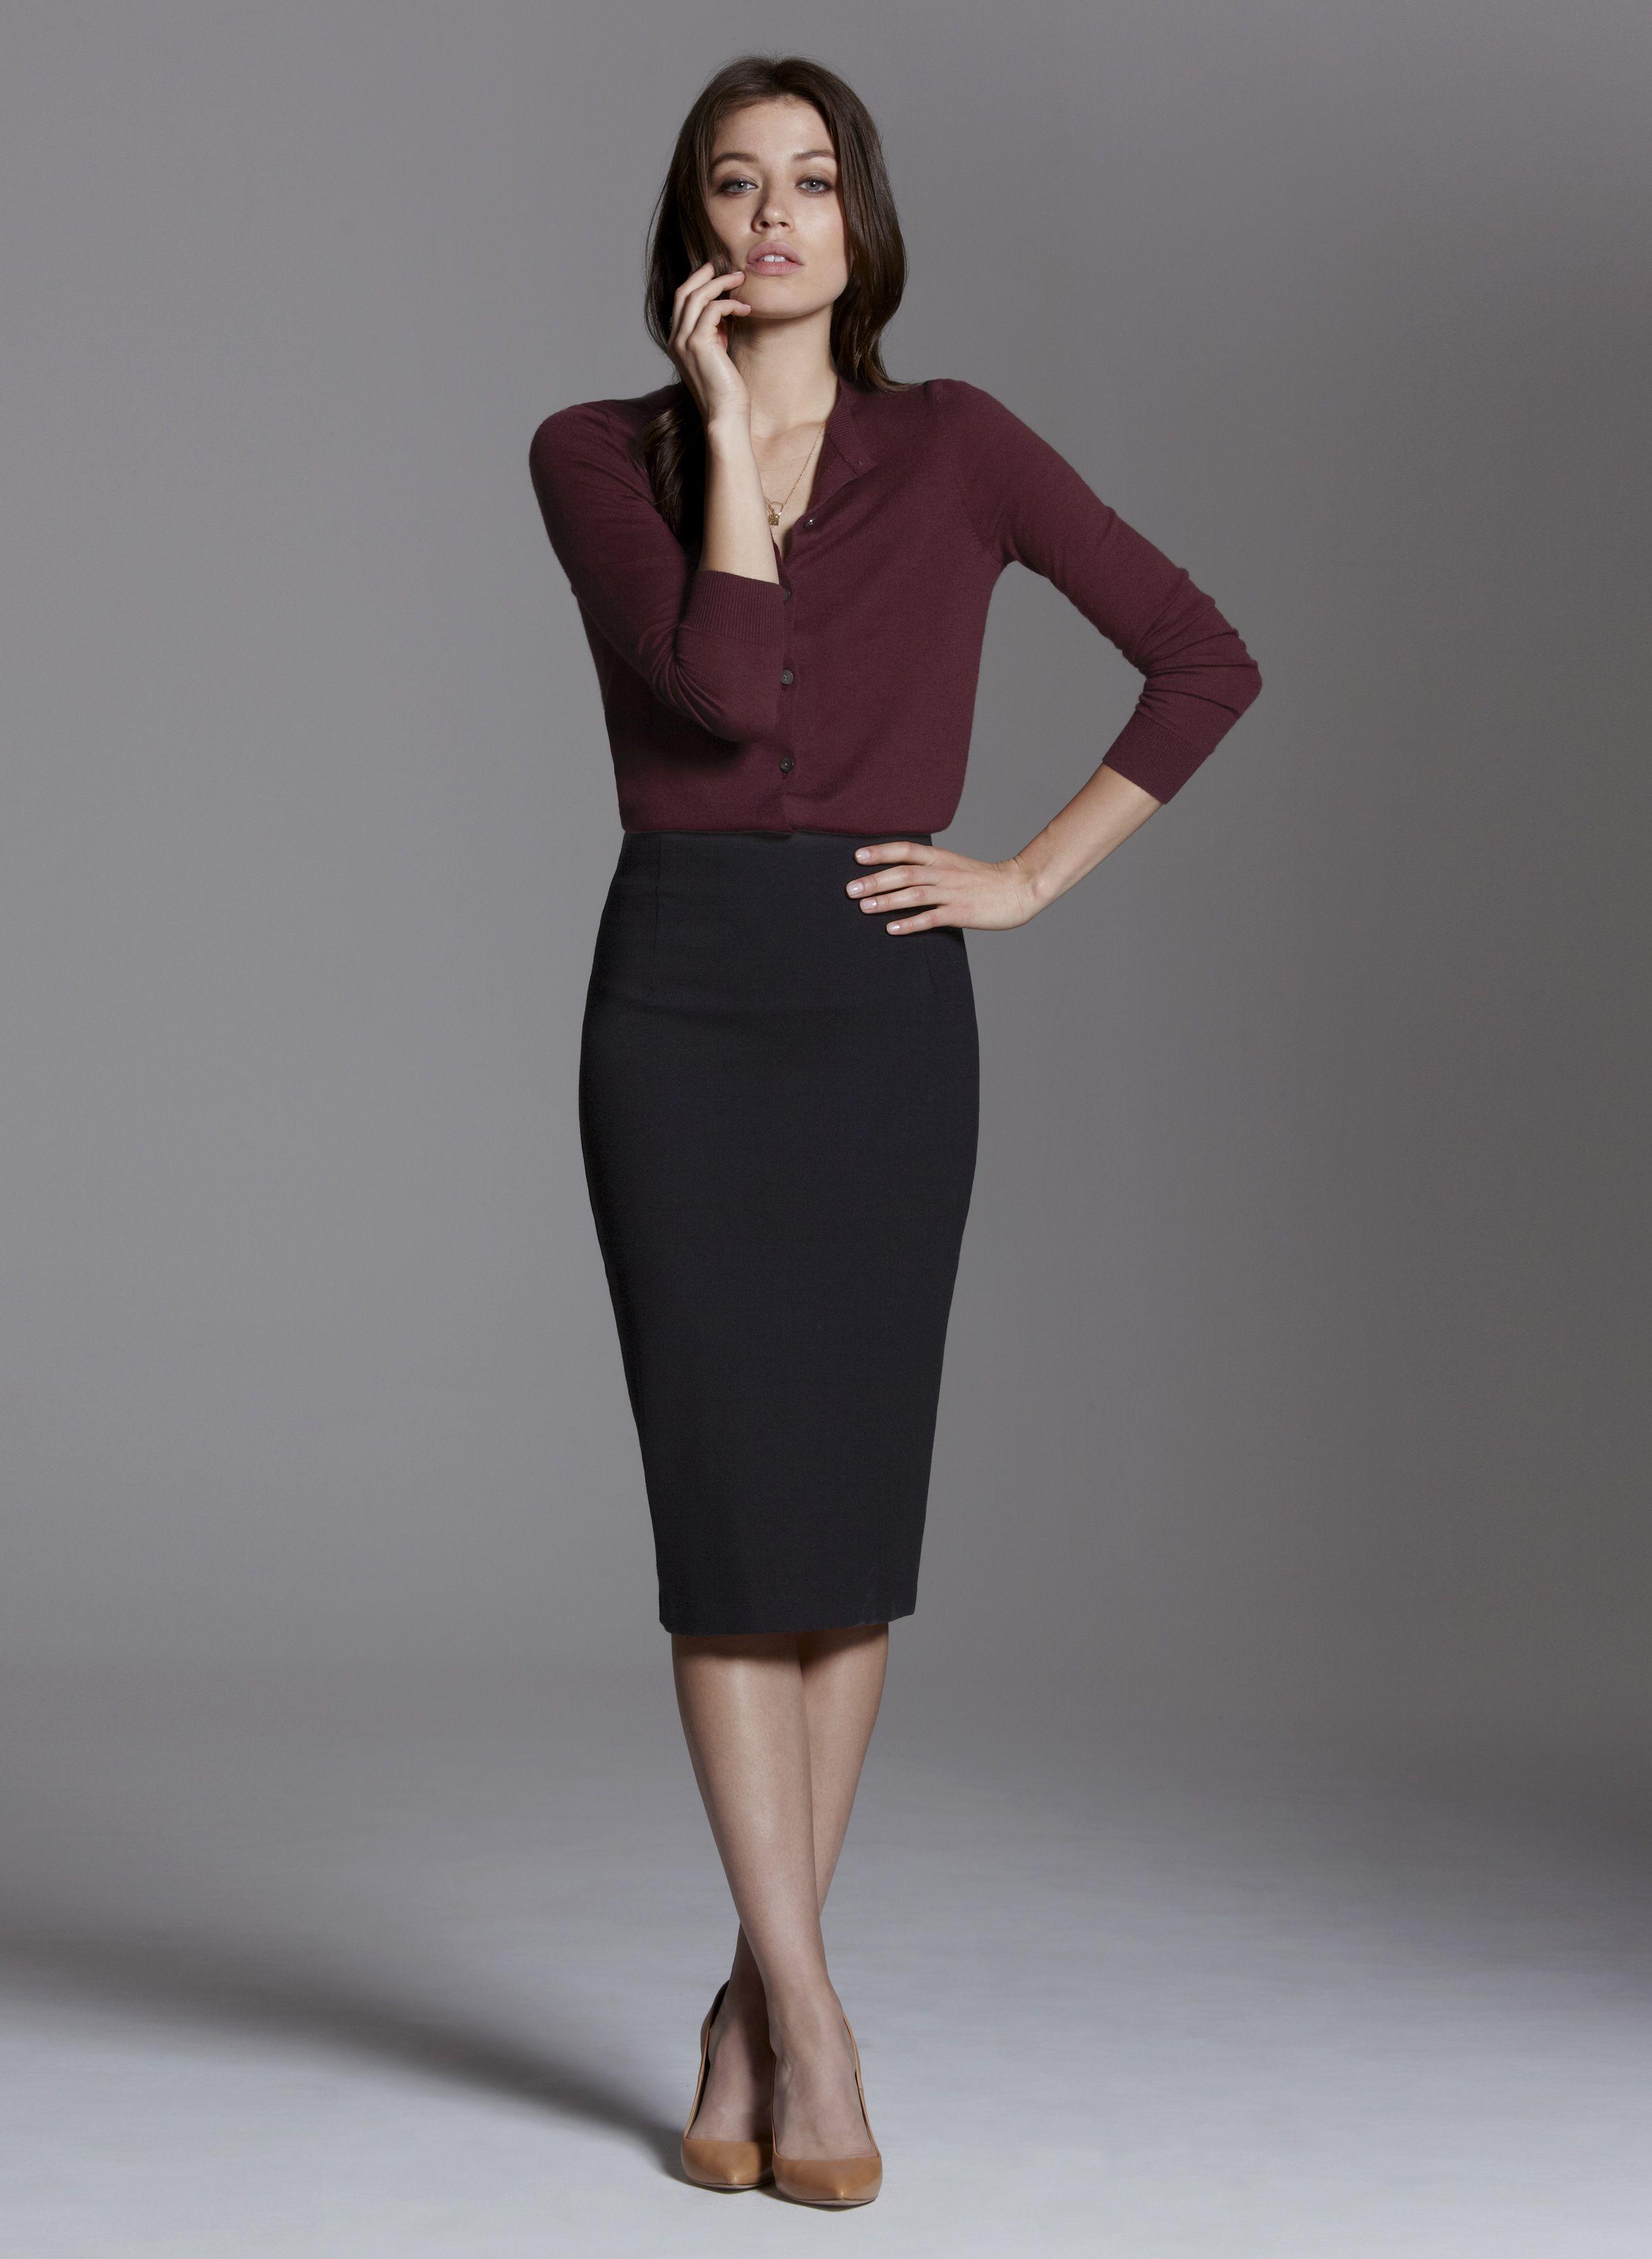 Chic Professional Woman Work Outfit. Baukjen | Skirt ...